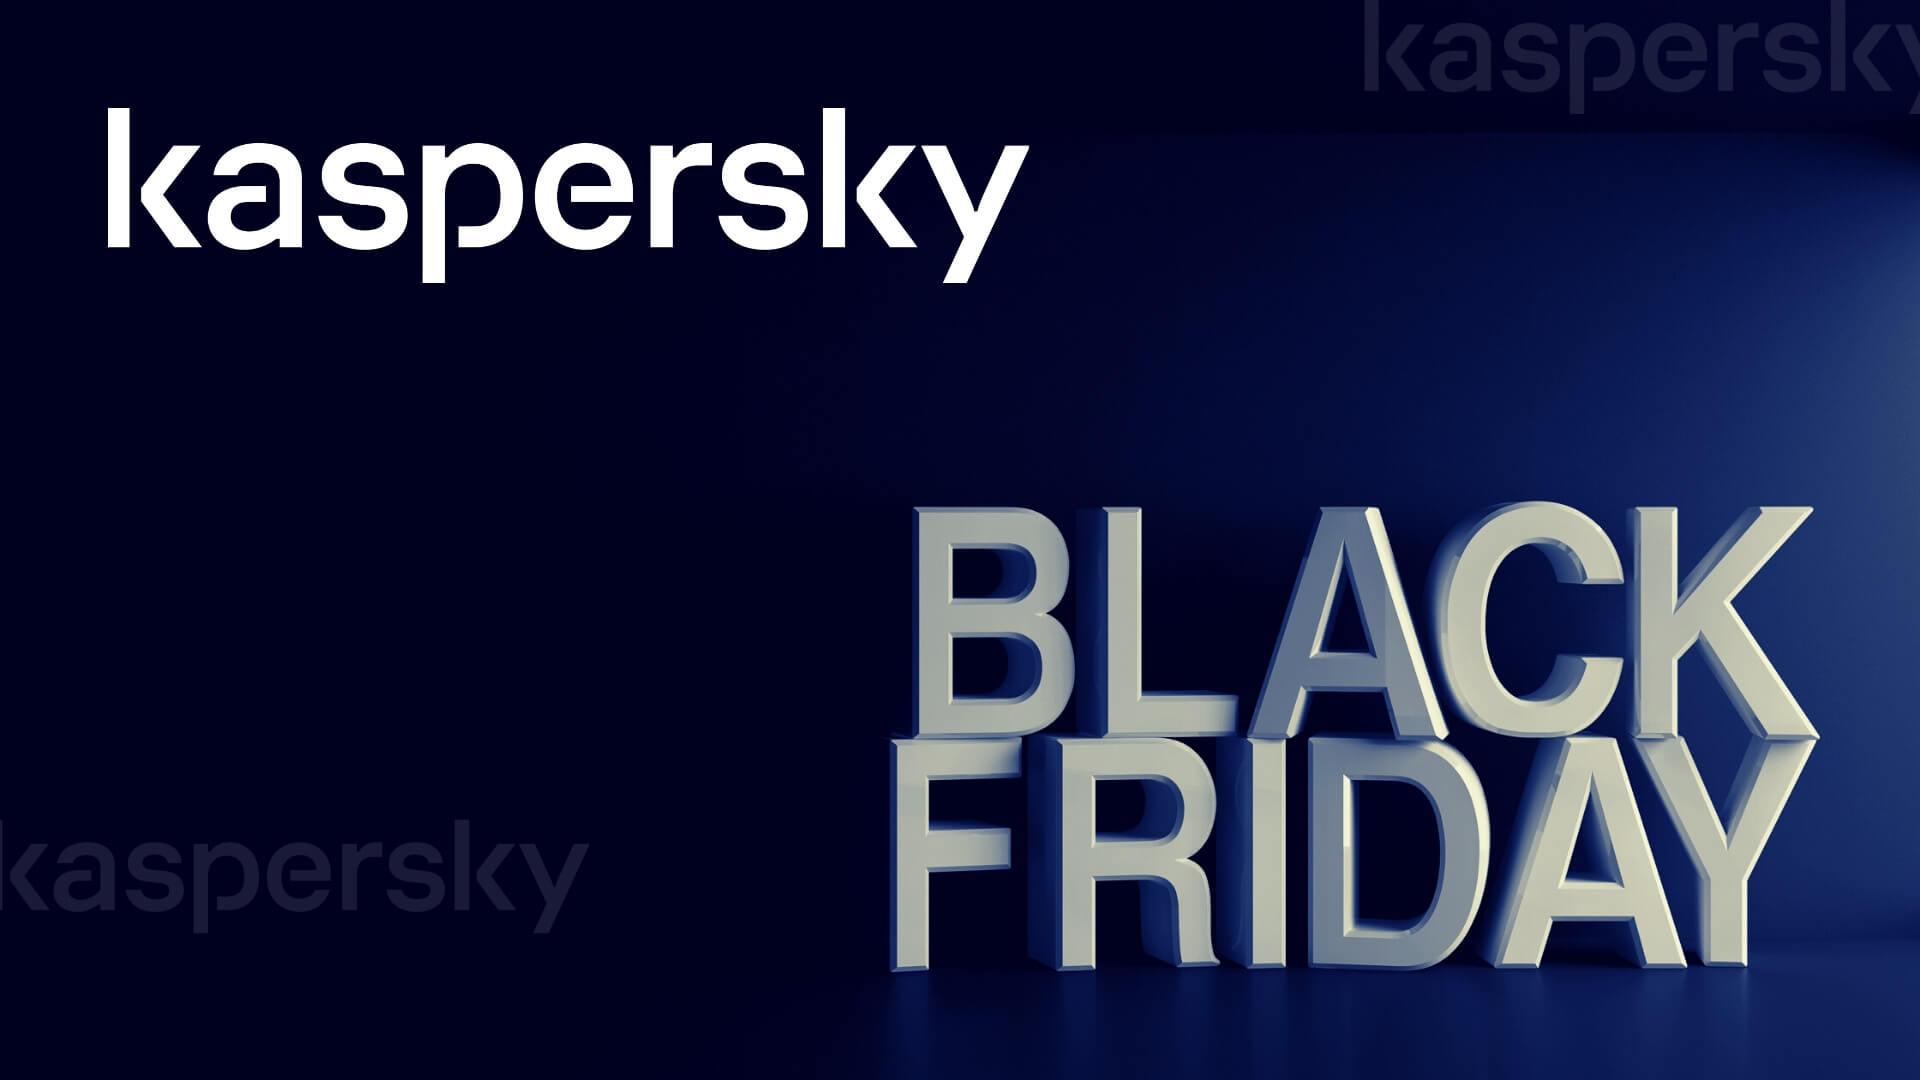 Kaspersky: nel 2020 spenderemo di pi? online per il Black Friday